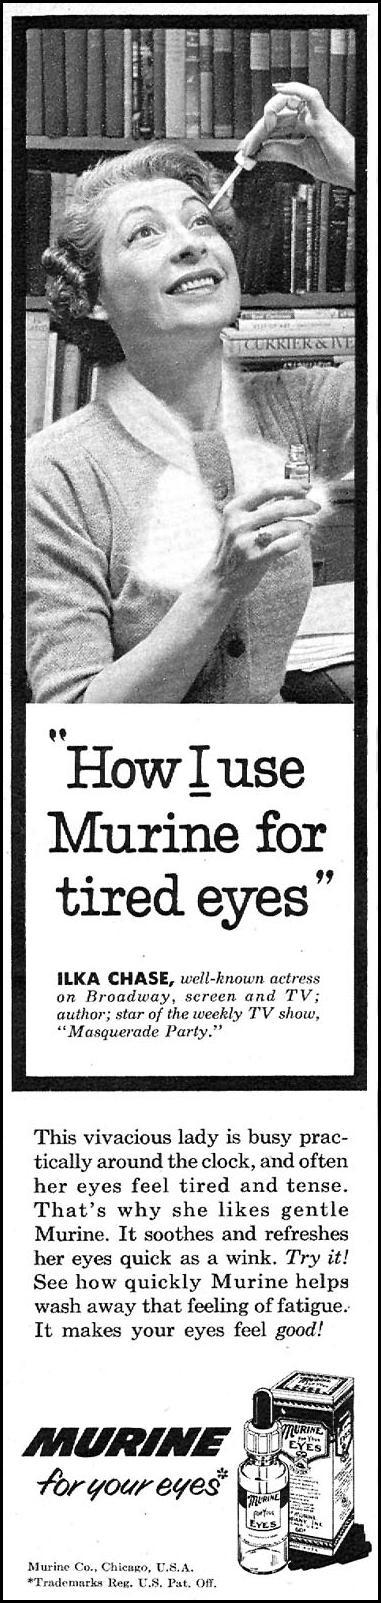 MURINE EYE DROPS FAMILY CIRCLE 01/01/1956 p. 72